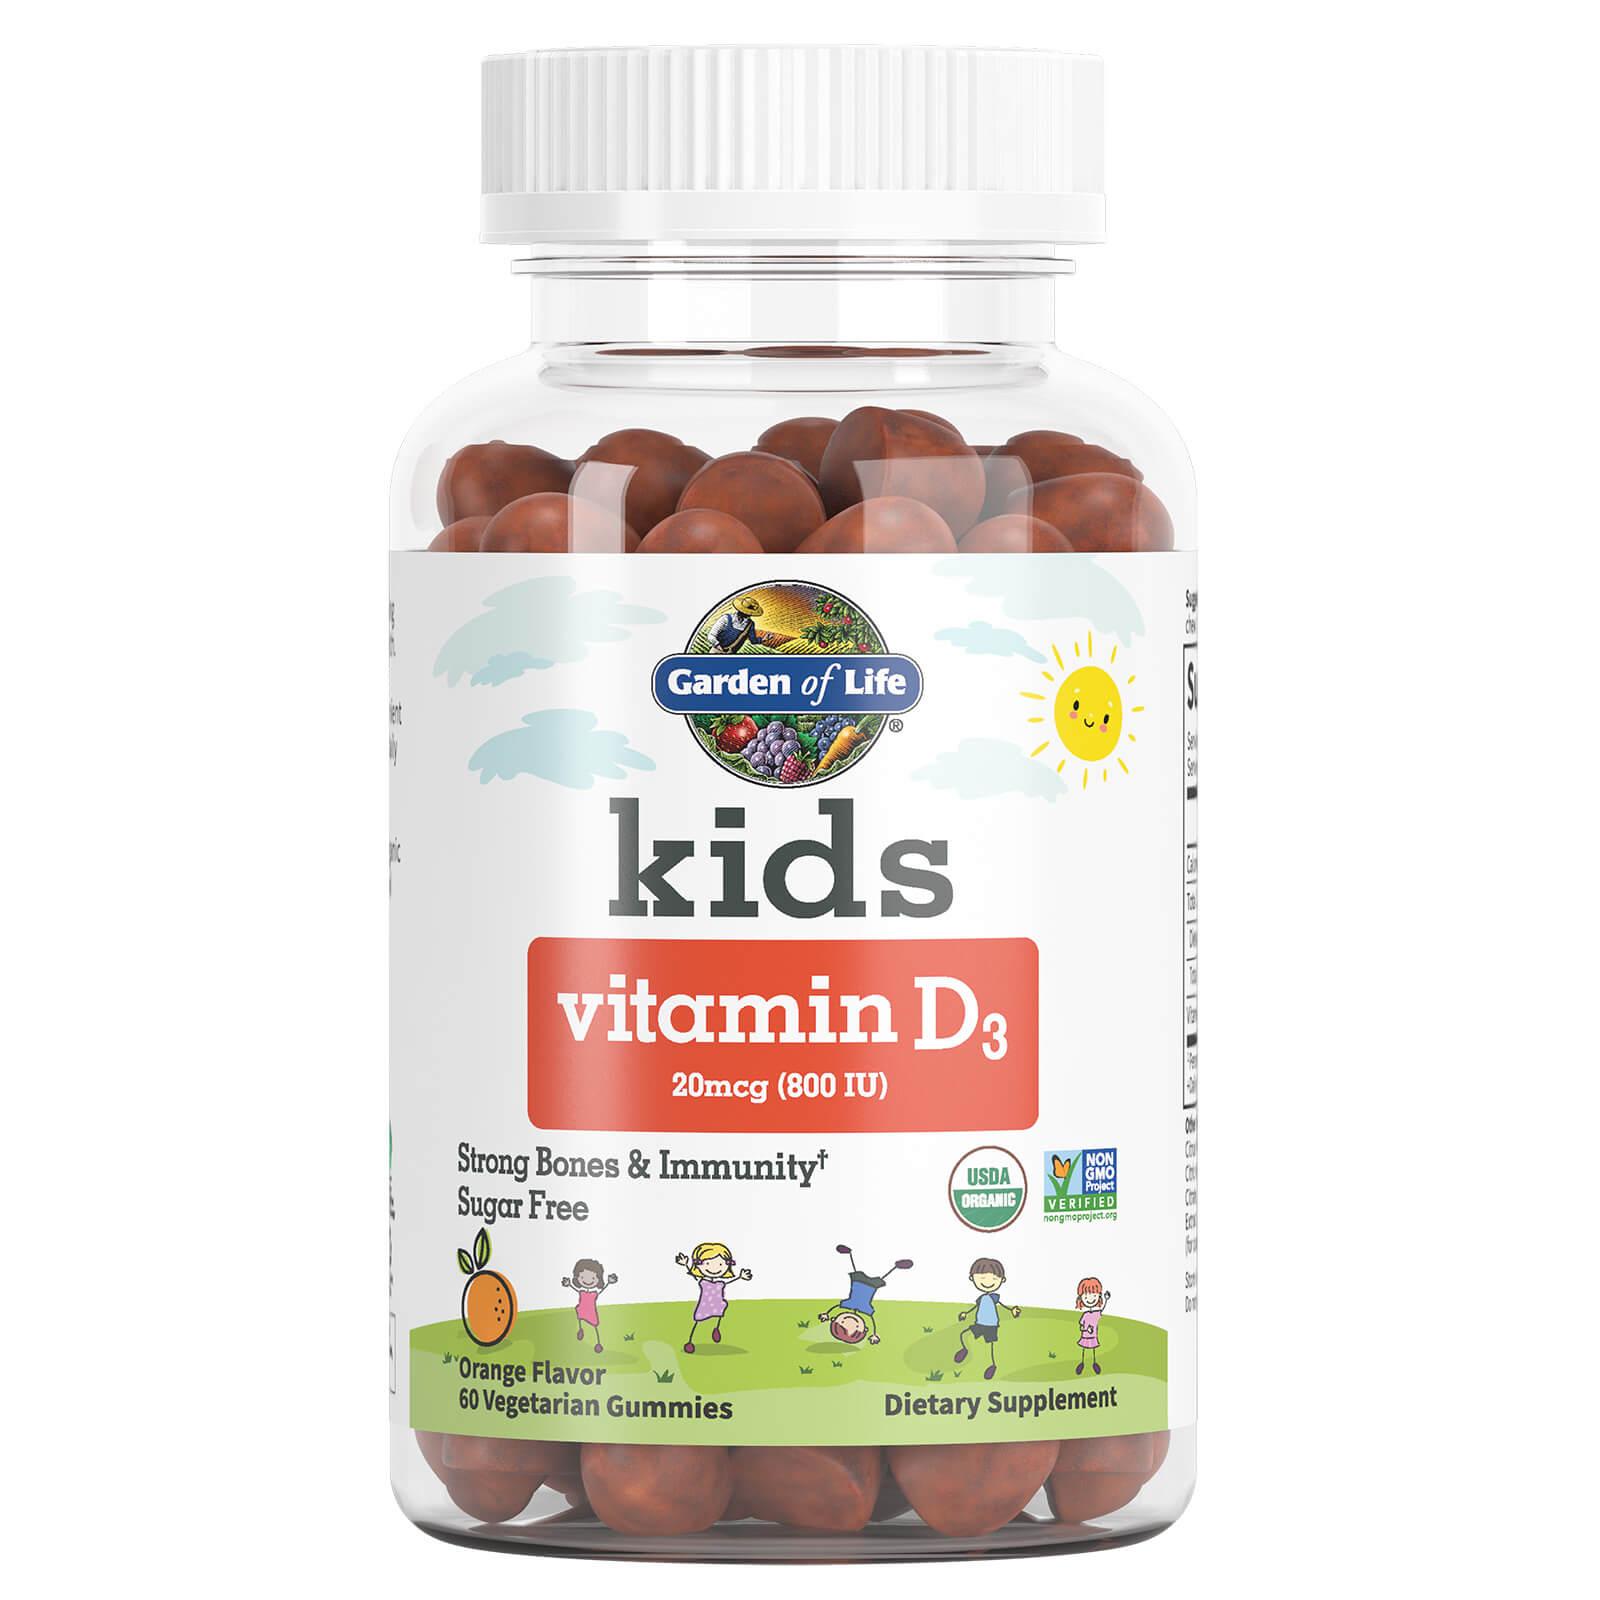 Kids Vitamine D3 Sinaasappelsmaak 20 mcg (800 IE) - 60 Gummies